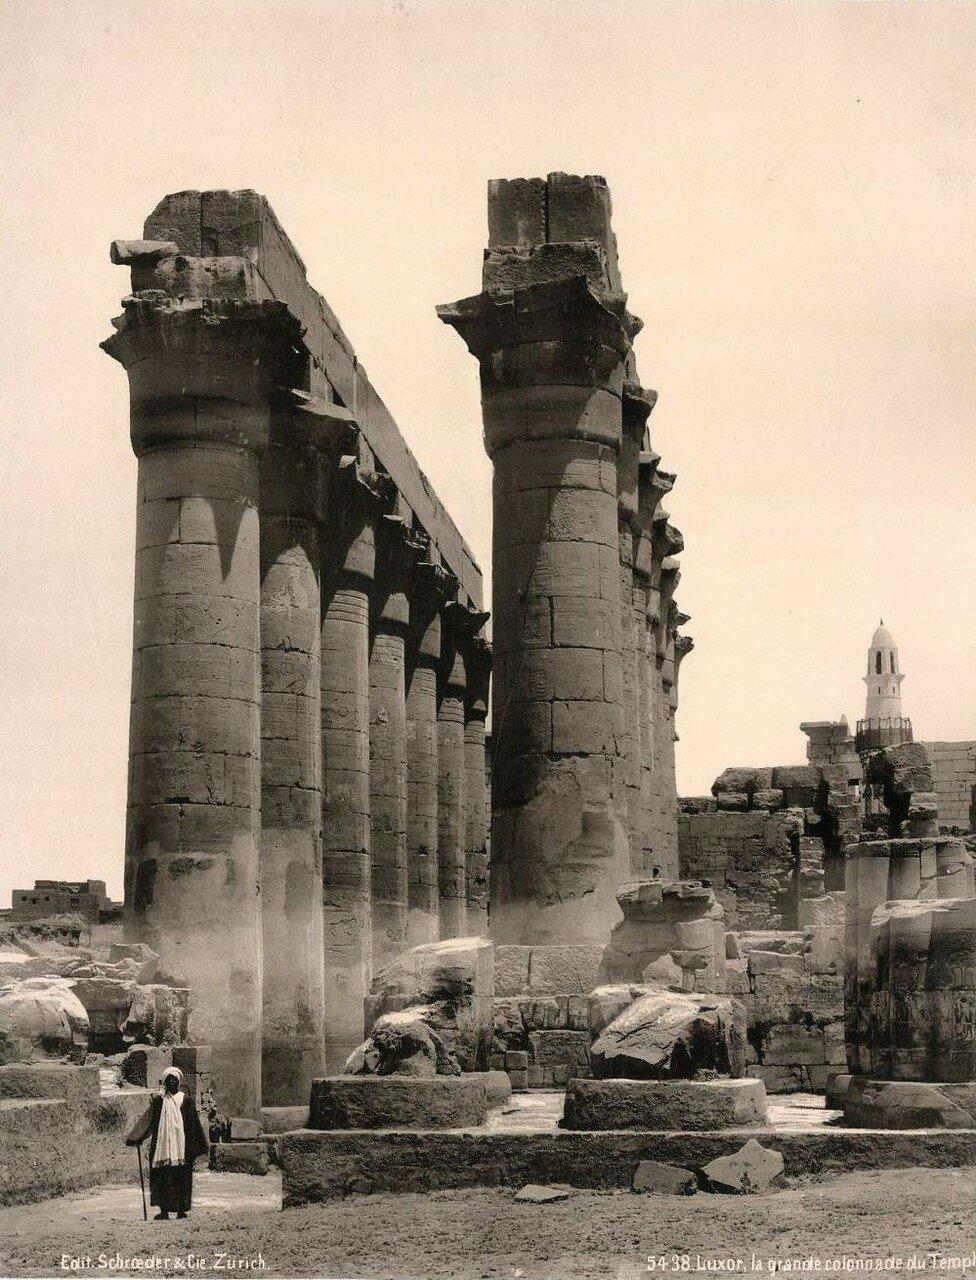 Луксорский храм.  Большая колоннада Аменхотепа III